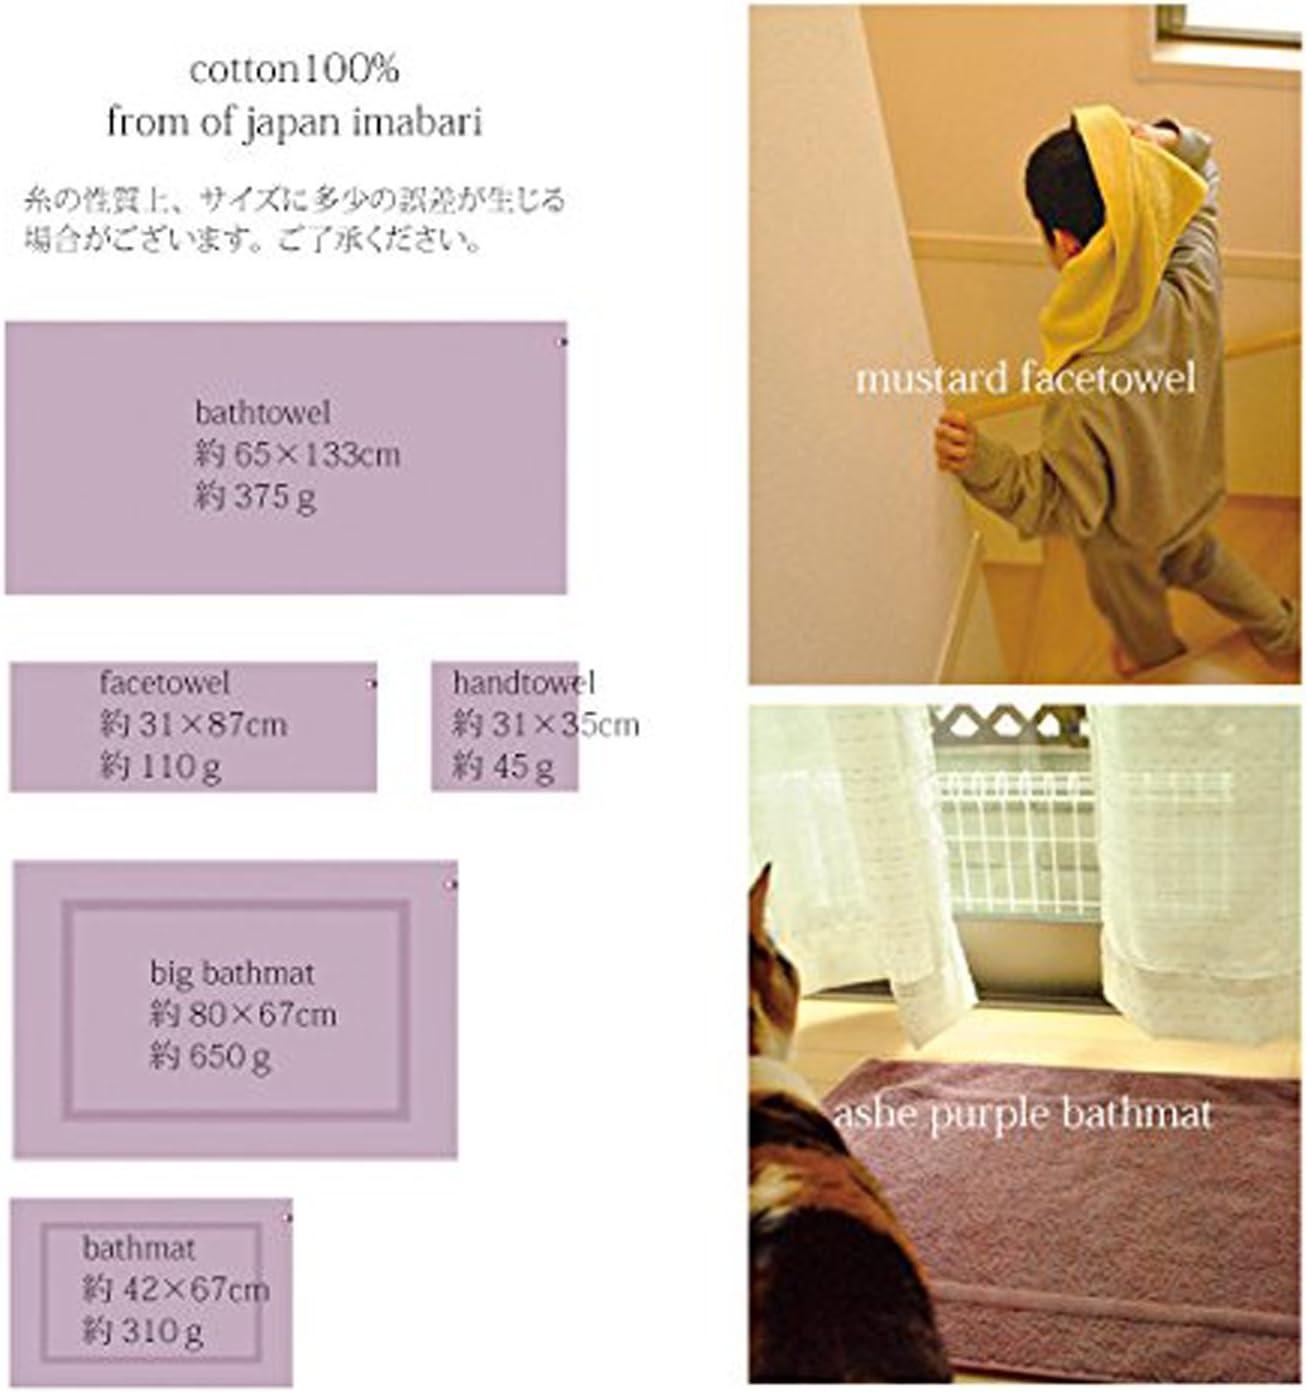 sea blue japan import Bath towel set of 2 cotton Imabari Sanhokin Leon